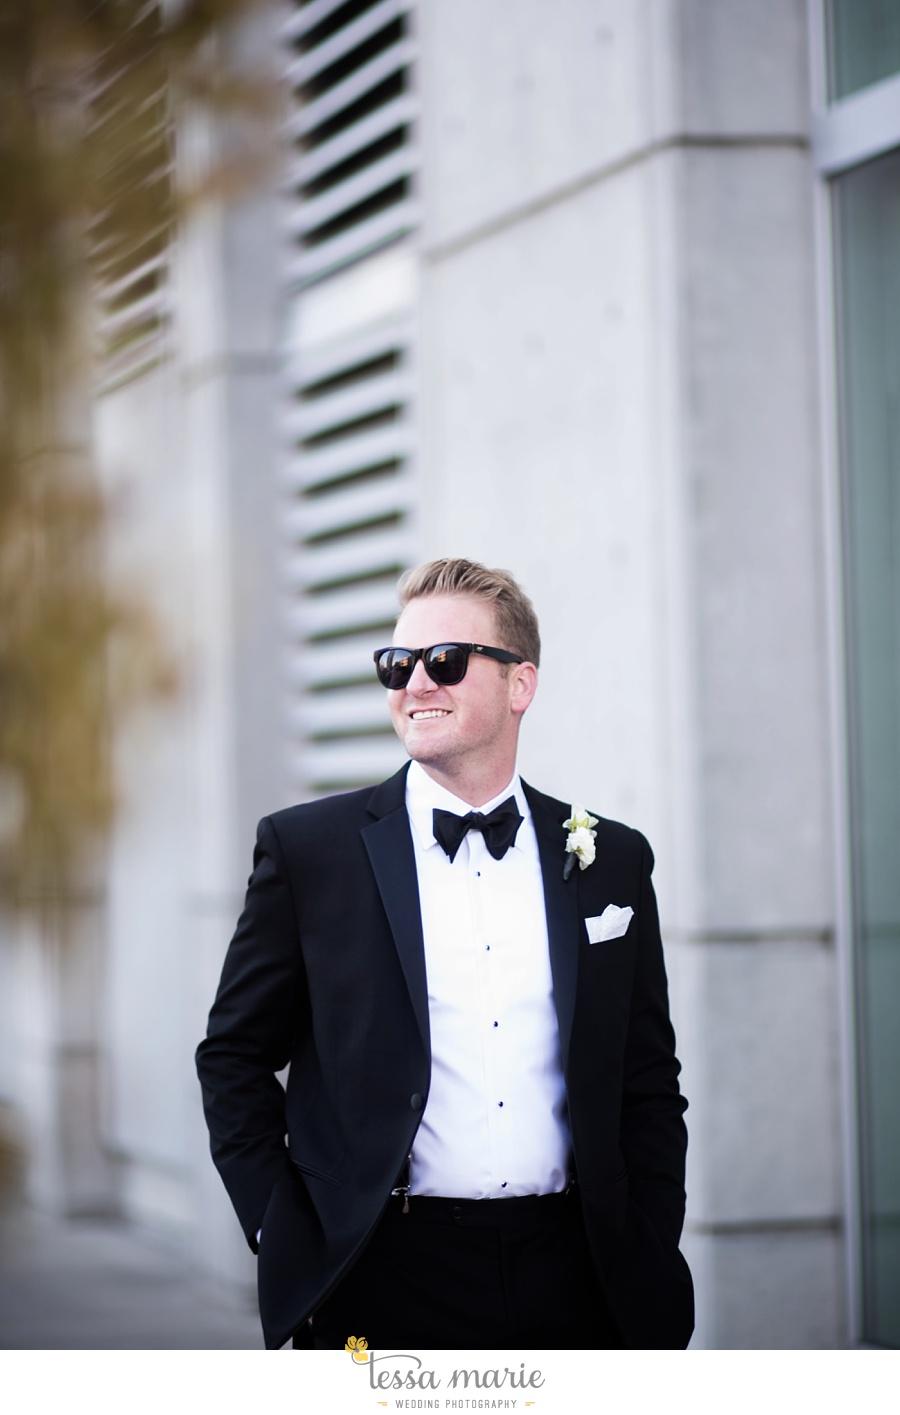 144_tessa_marie_weddings_emotional_moments_photography_king_low_wedding_sam_neil_best_atlanta_wedding_photographer